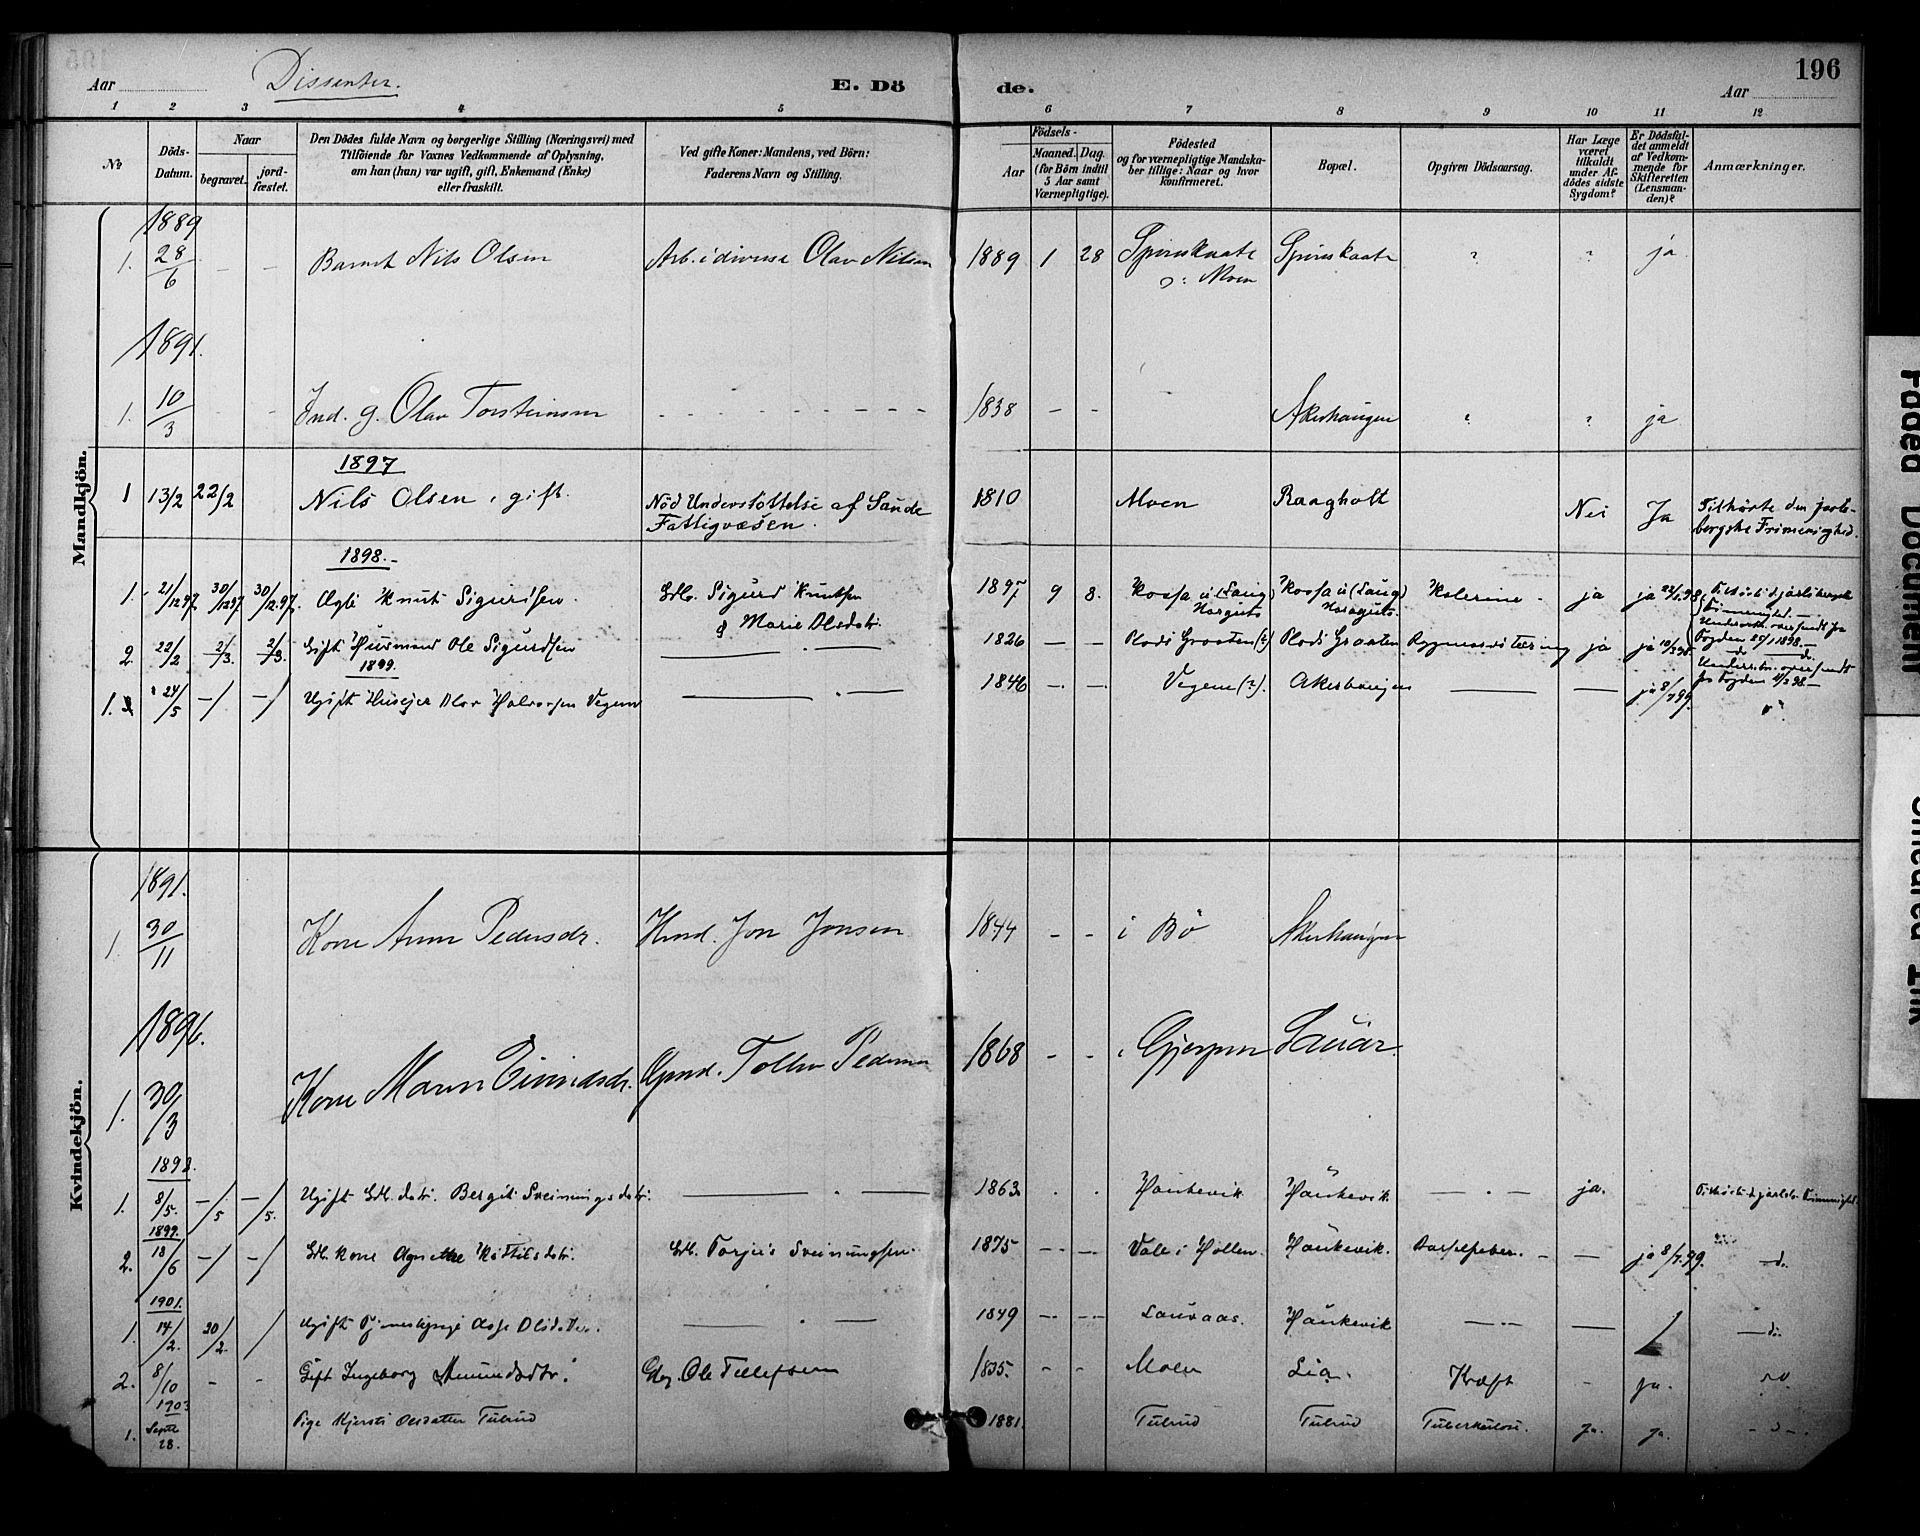 SAKO, Sauherad kirkebøker, F/Fa/L0009: Ministerialbok nr. I 9, 1887-1912, s. 196